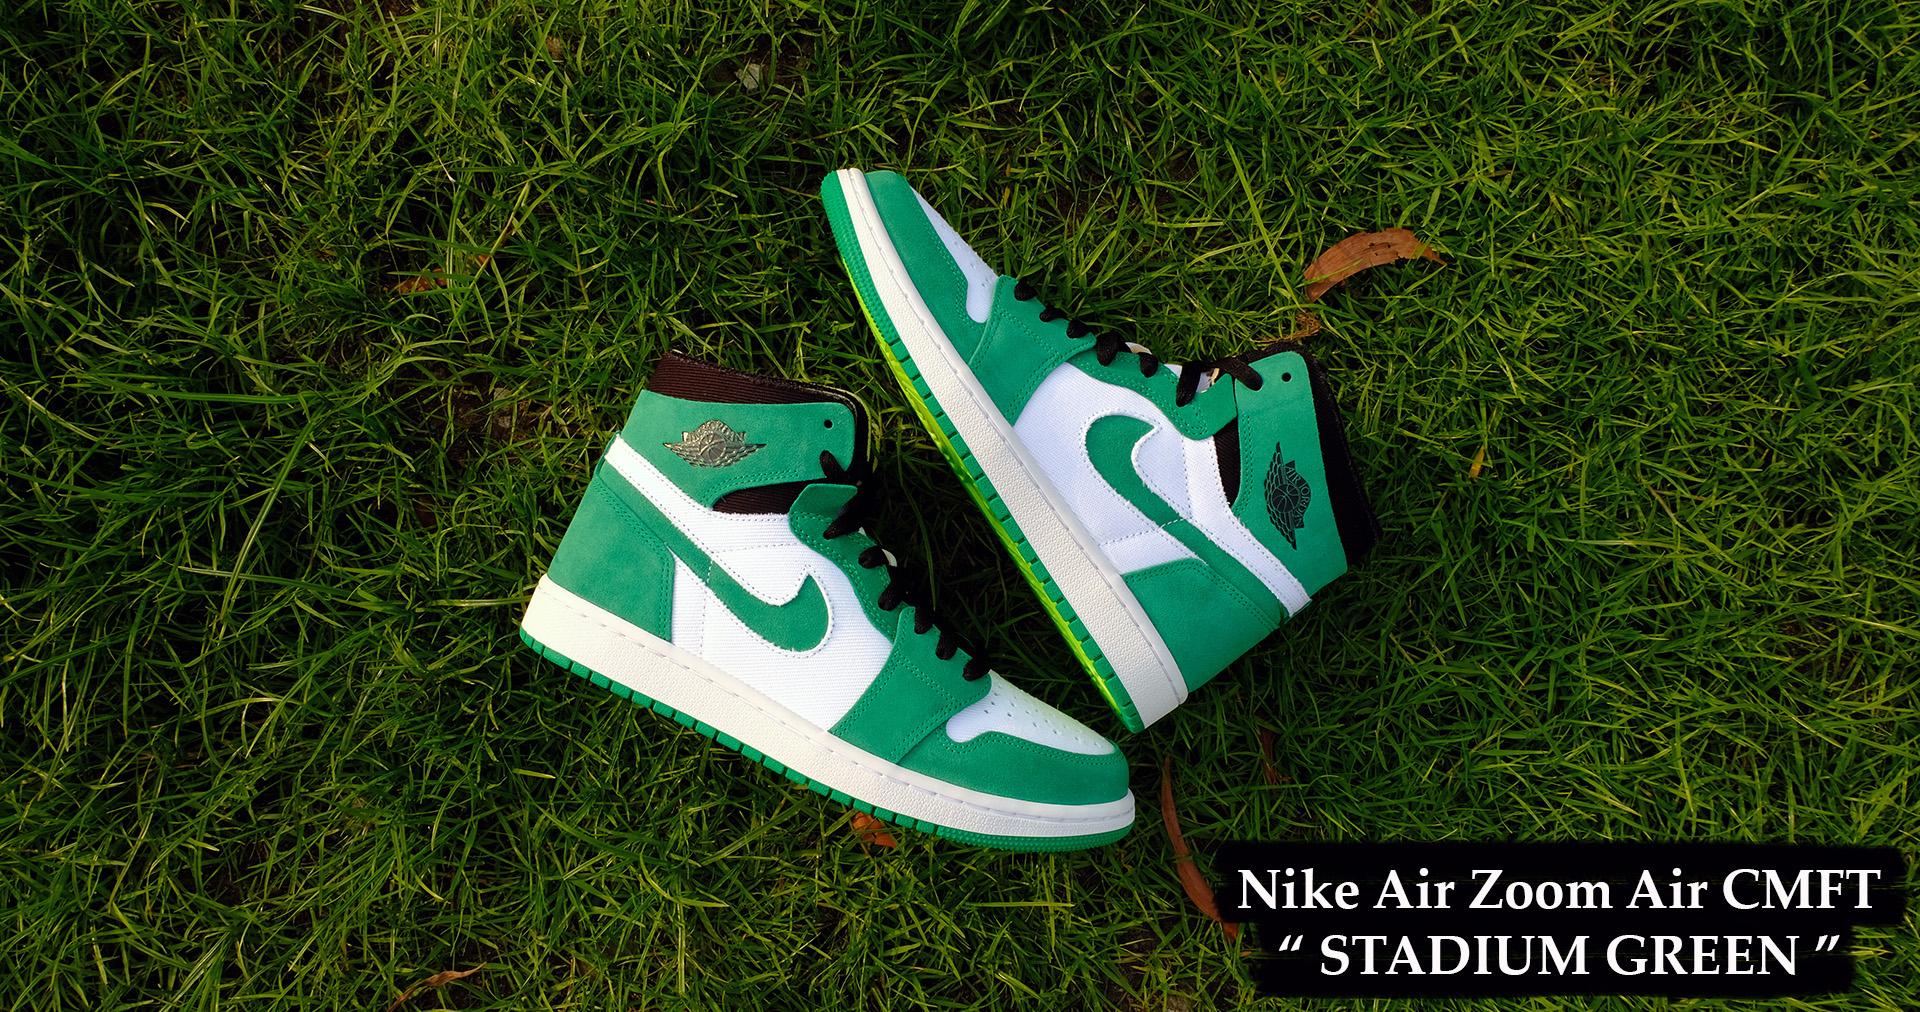 stadium green